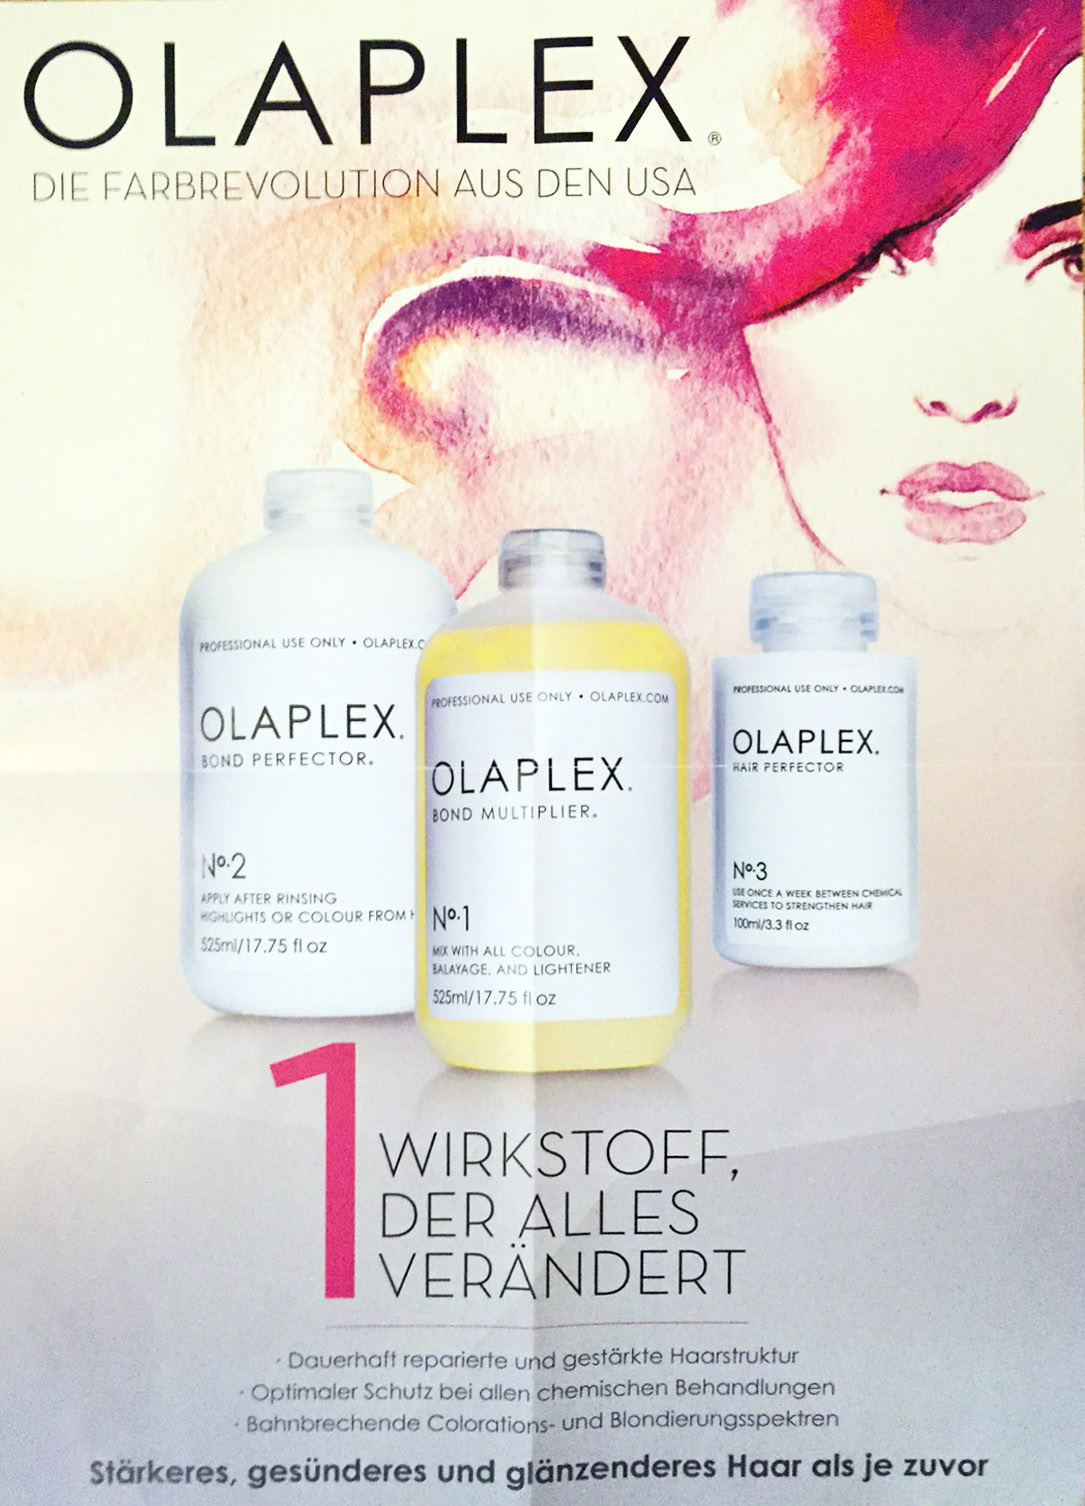 Olaplex Plakat